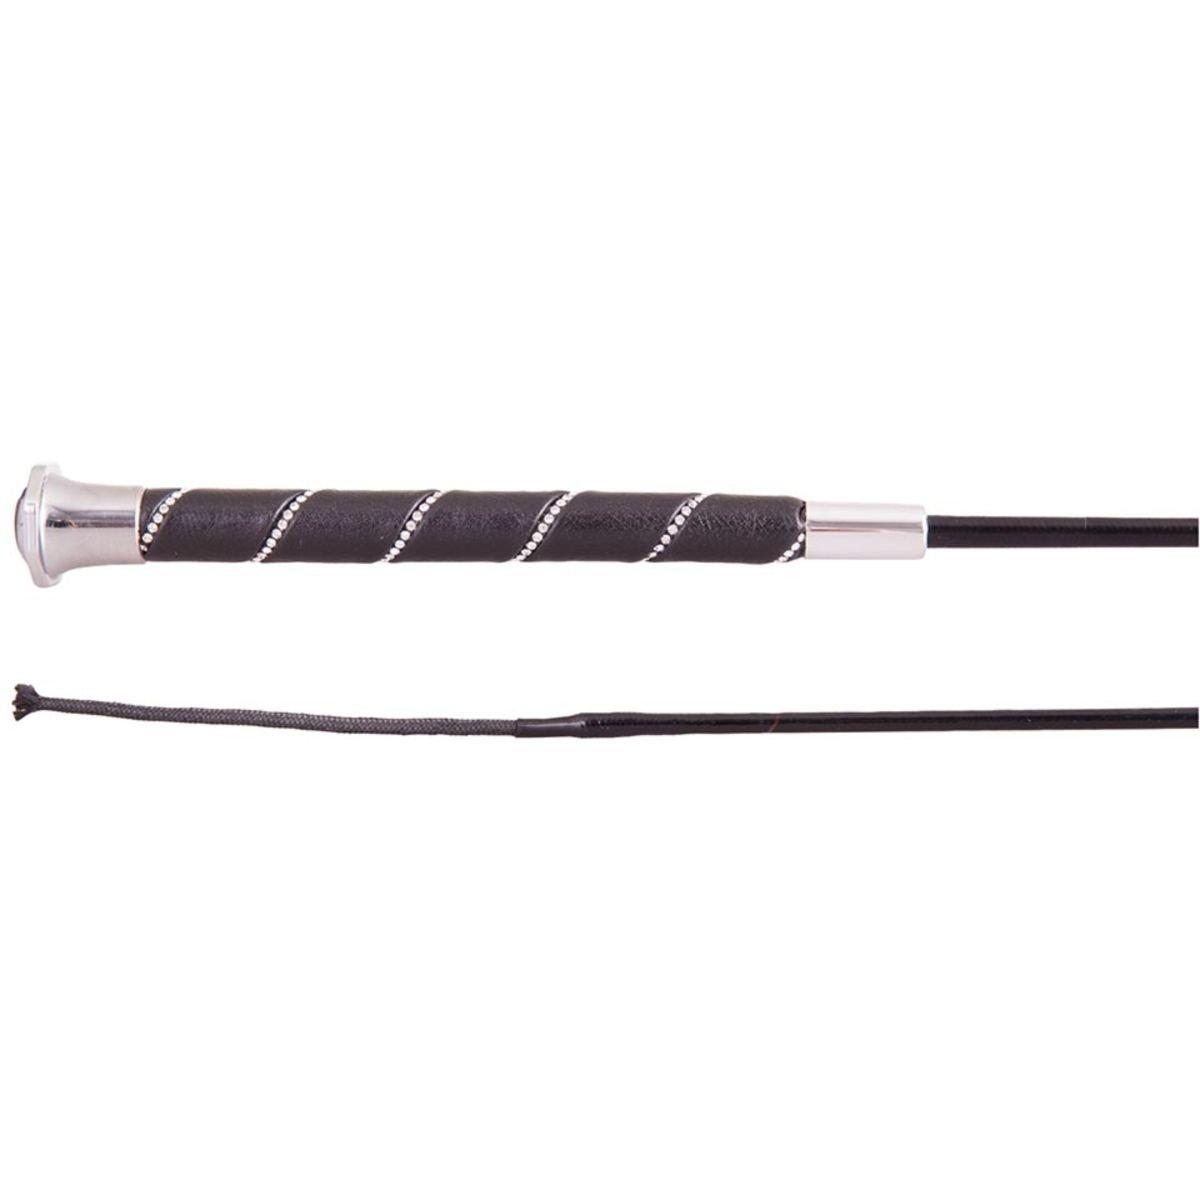 Imagem de BR Dressage Whip Orion Black / Silver 100cm